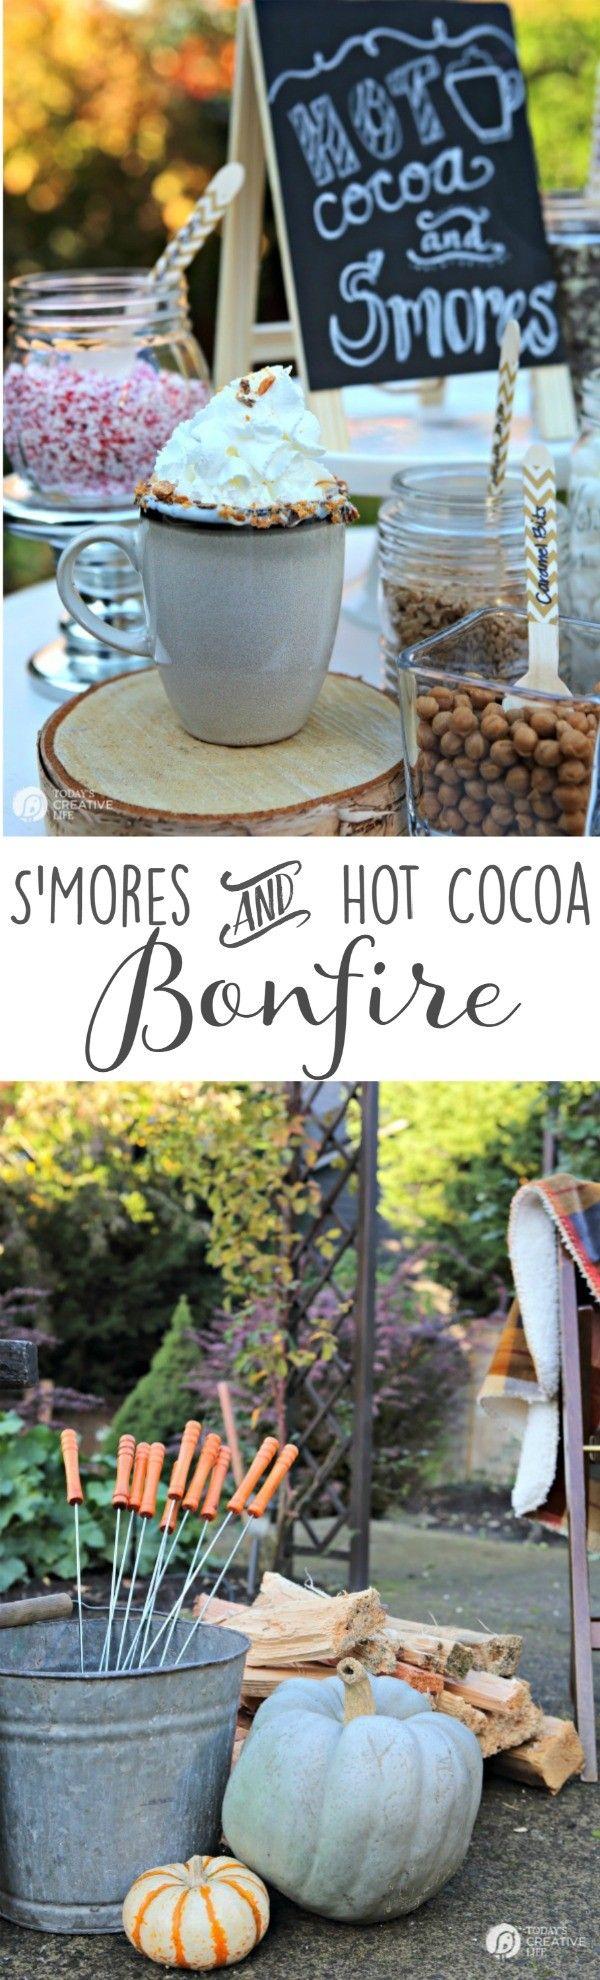 Easy Entertaining! S'Mores & Hot Cocoa Bonfire Back yard